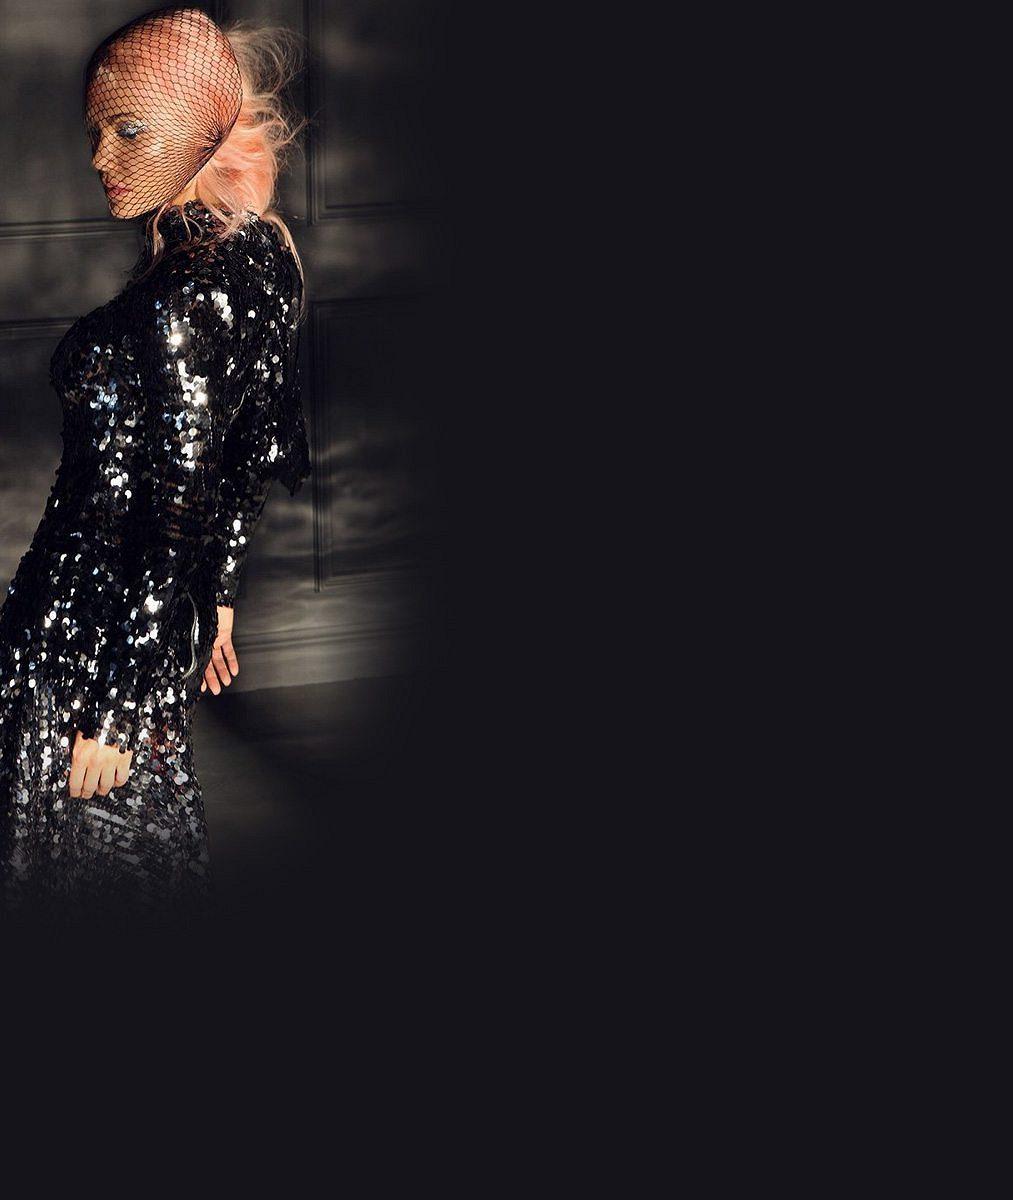 Poprvé od rozchodu s Rytmusem mezi lidmi. Dara oblékla na večírek teplákovku